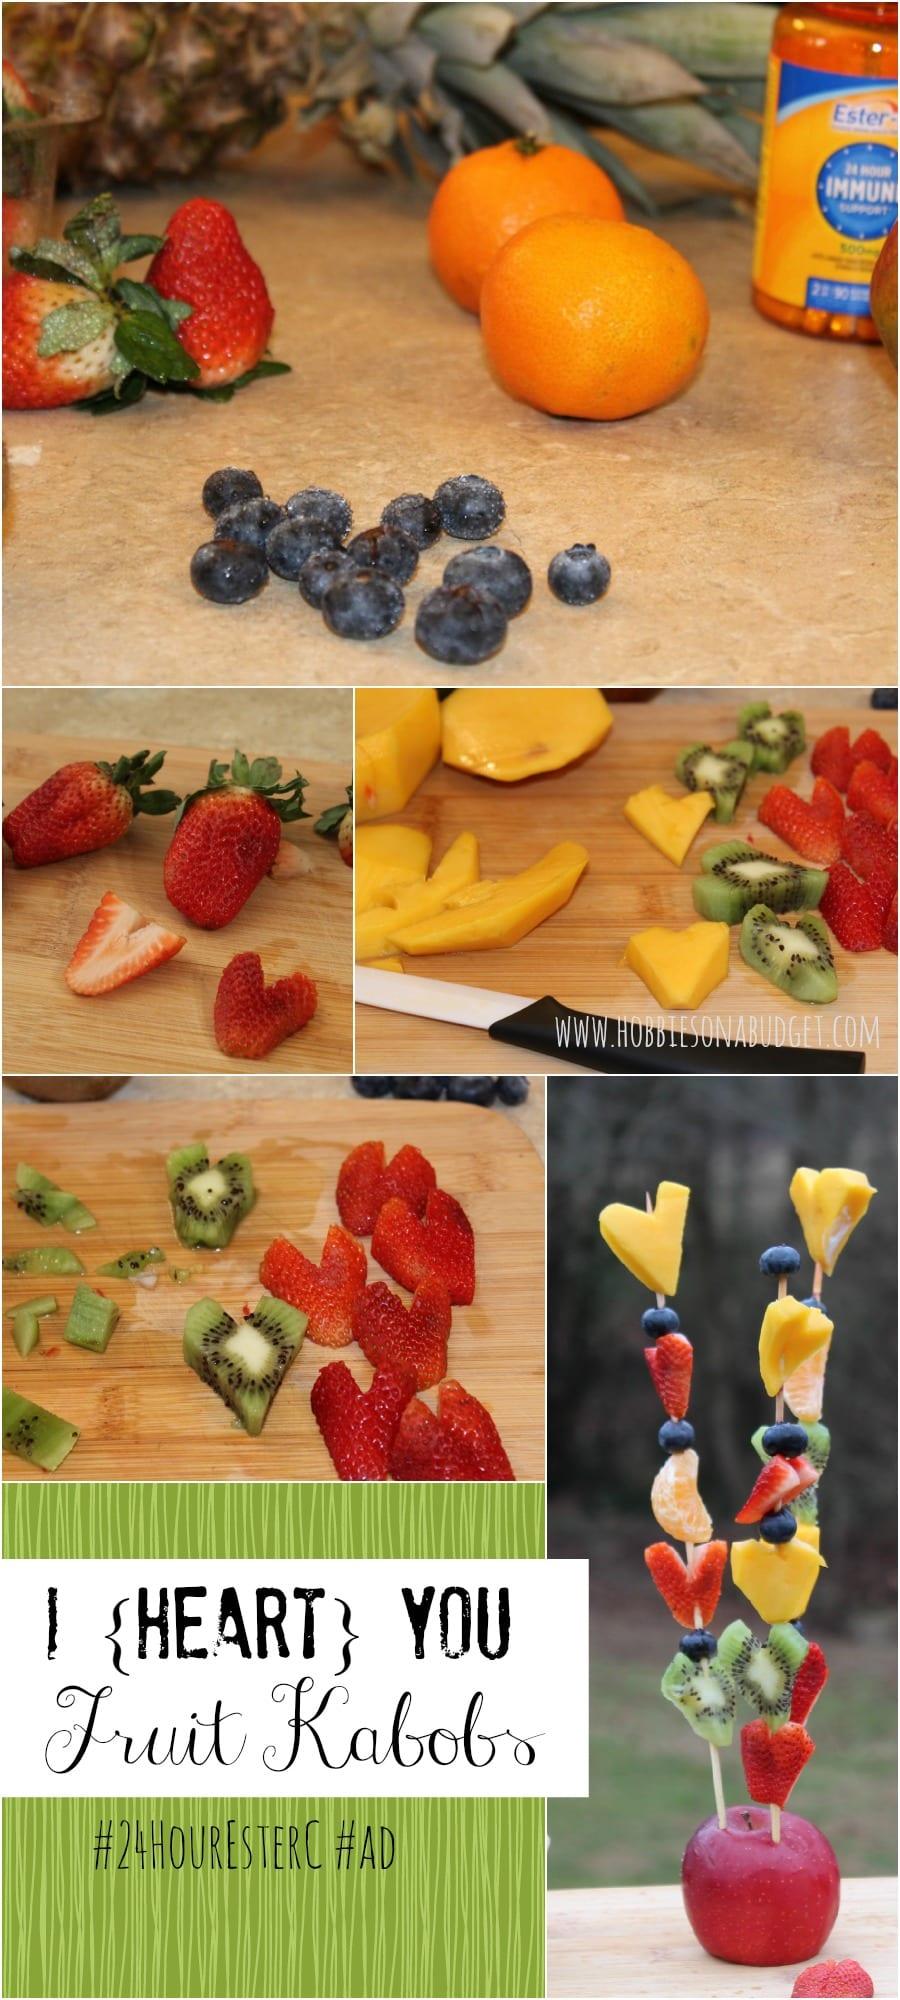 i heart you fruit kabobs